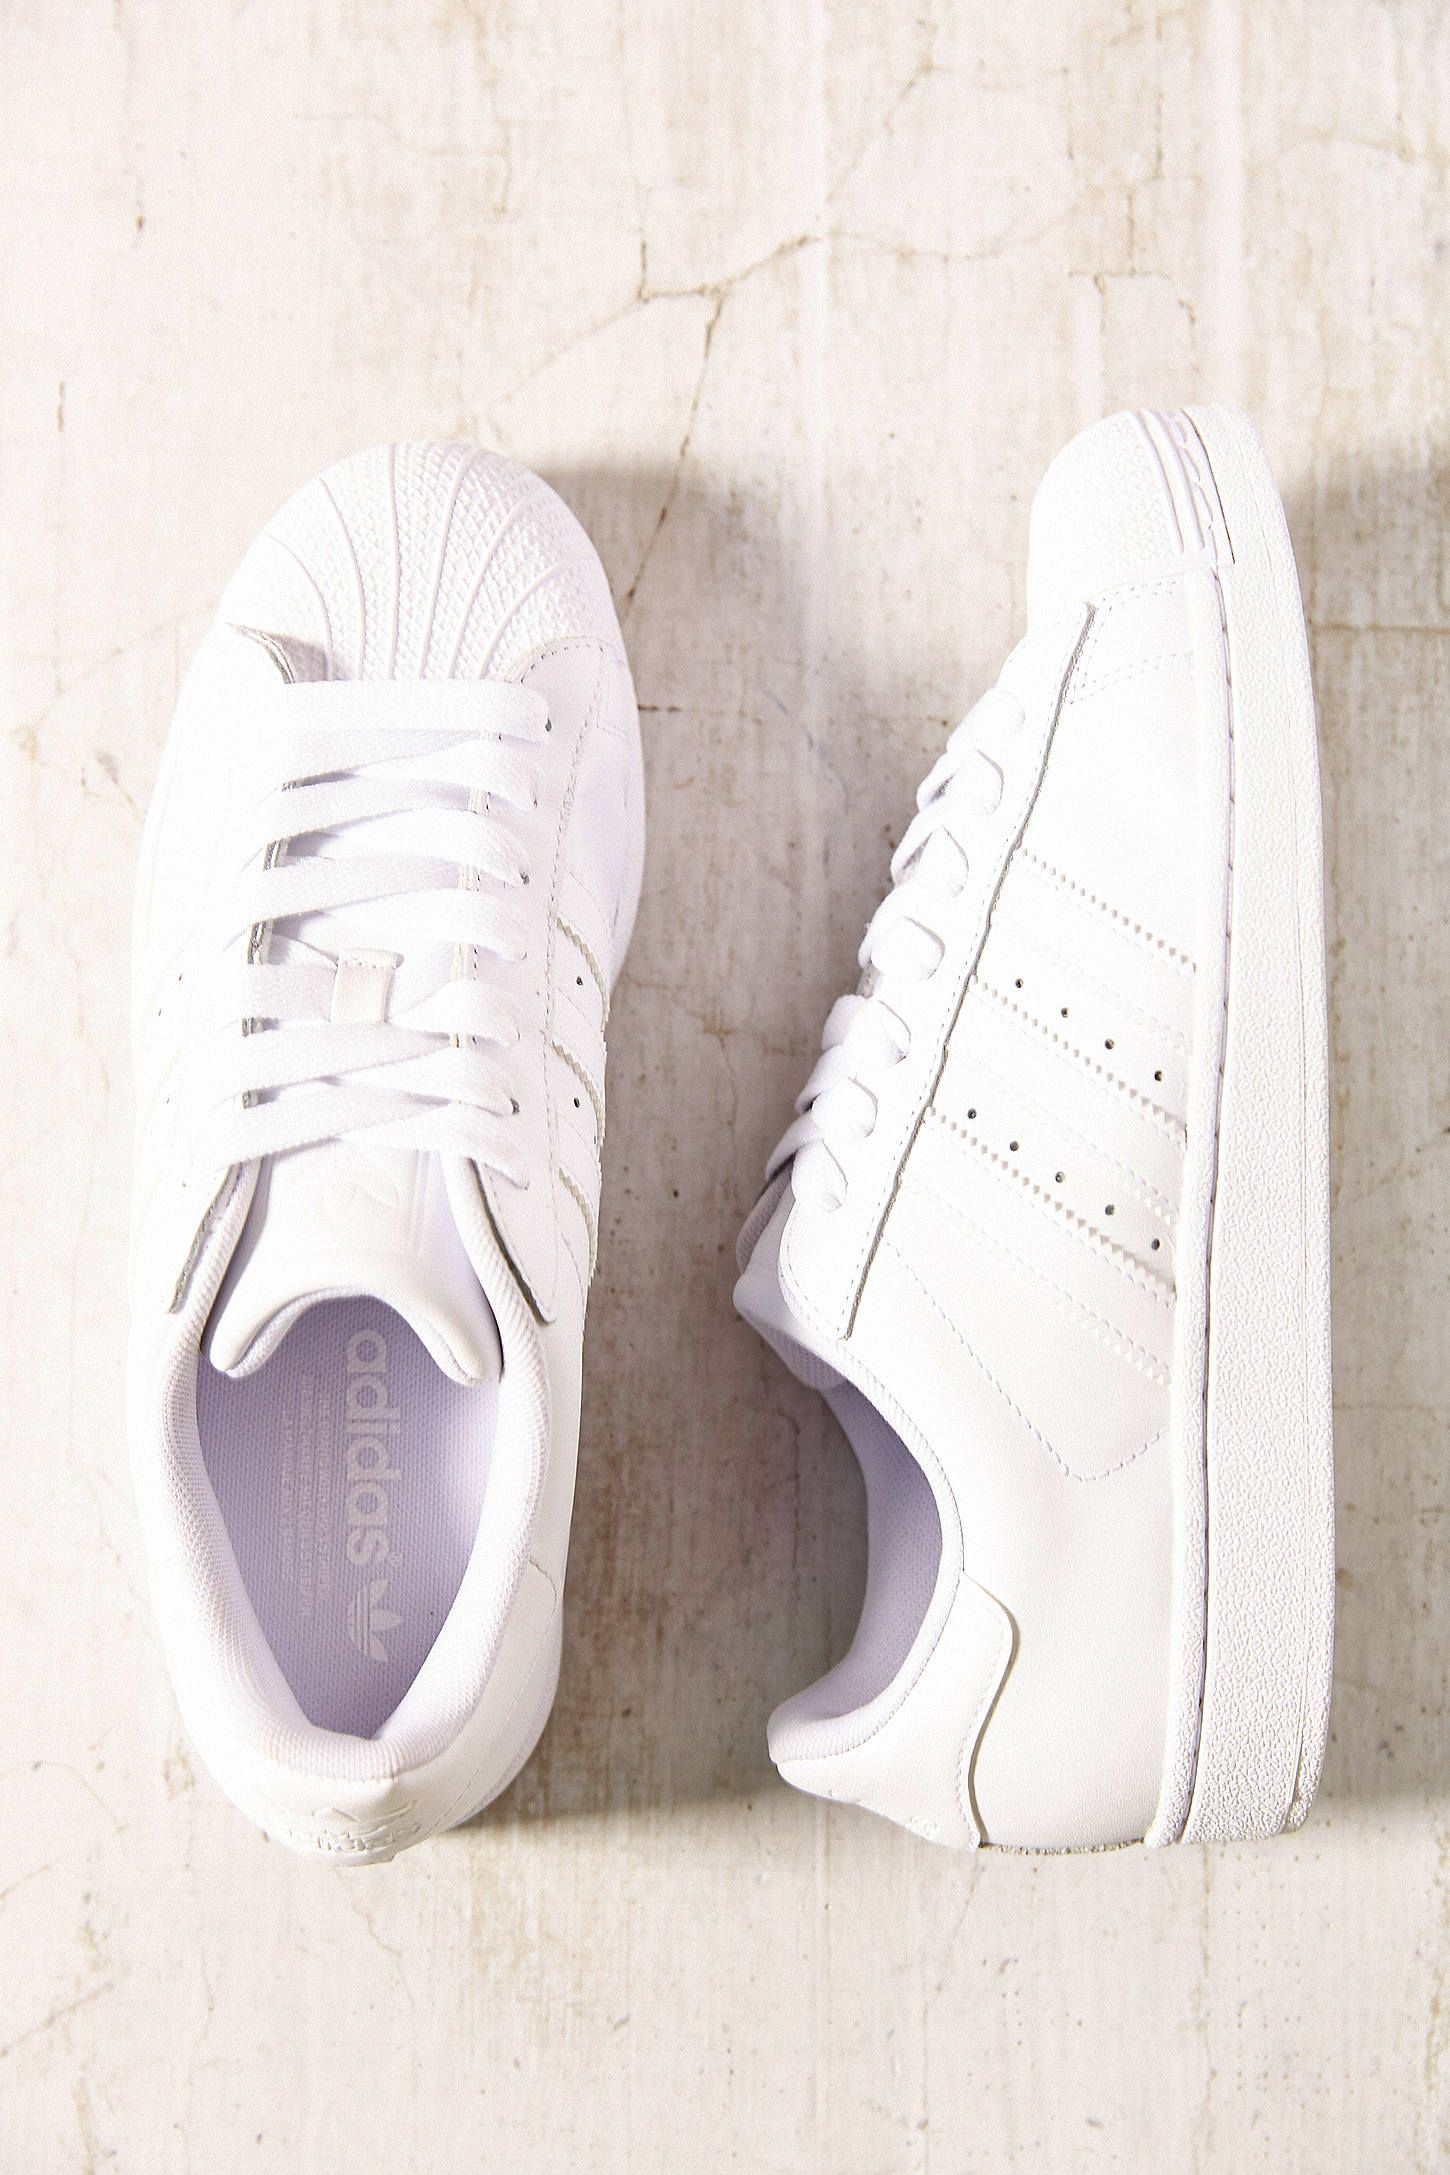 quality design 9e654 535f9 adidas Originals Sneaker 9724 Superstar Sneaker     d797000 -  www.alleinunterhalter.online